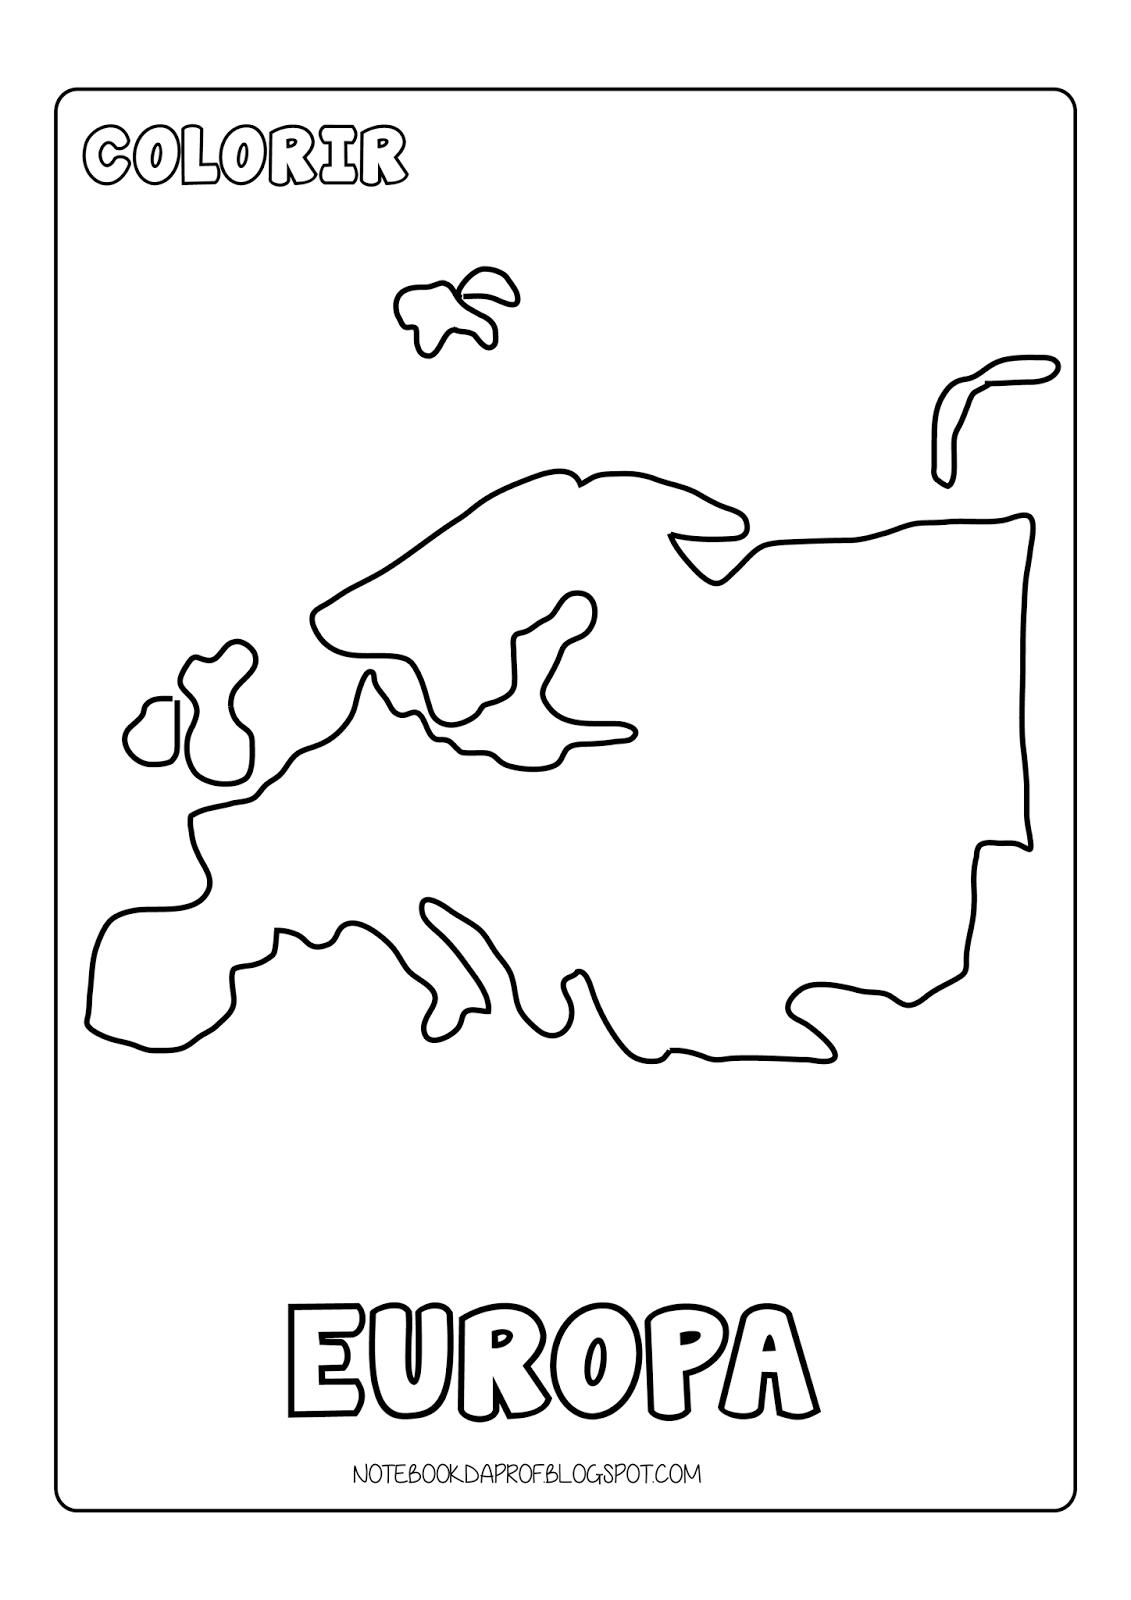 Colorir Continentes Poster